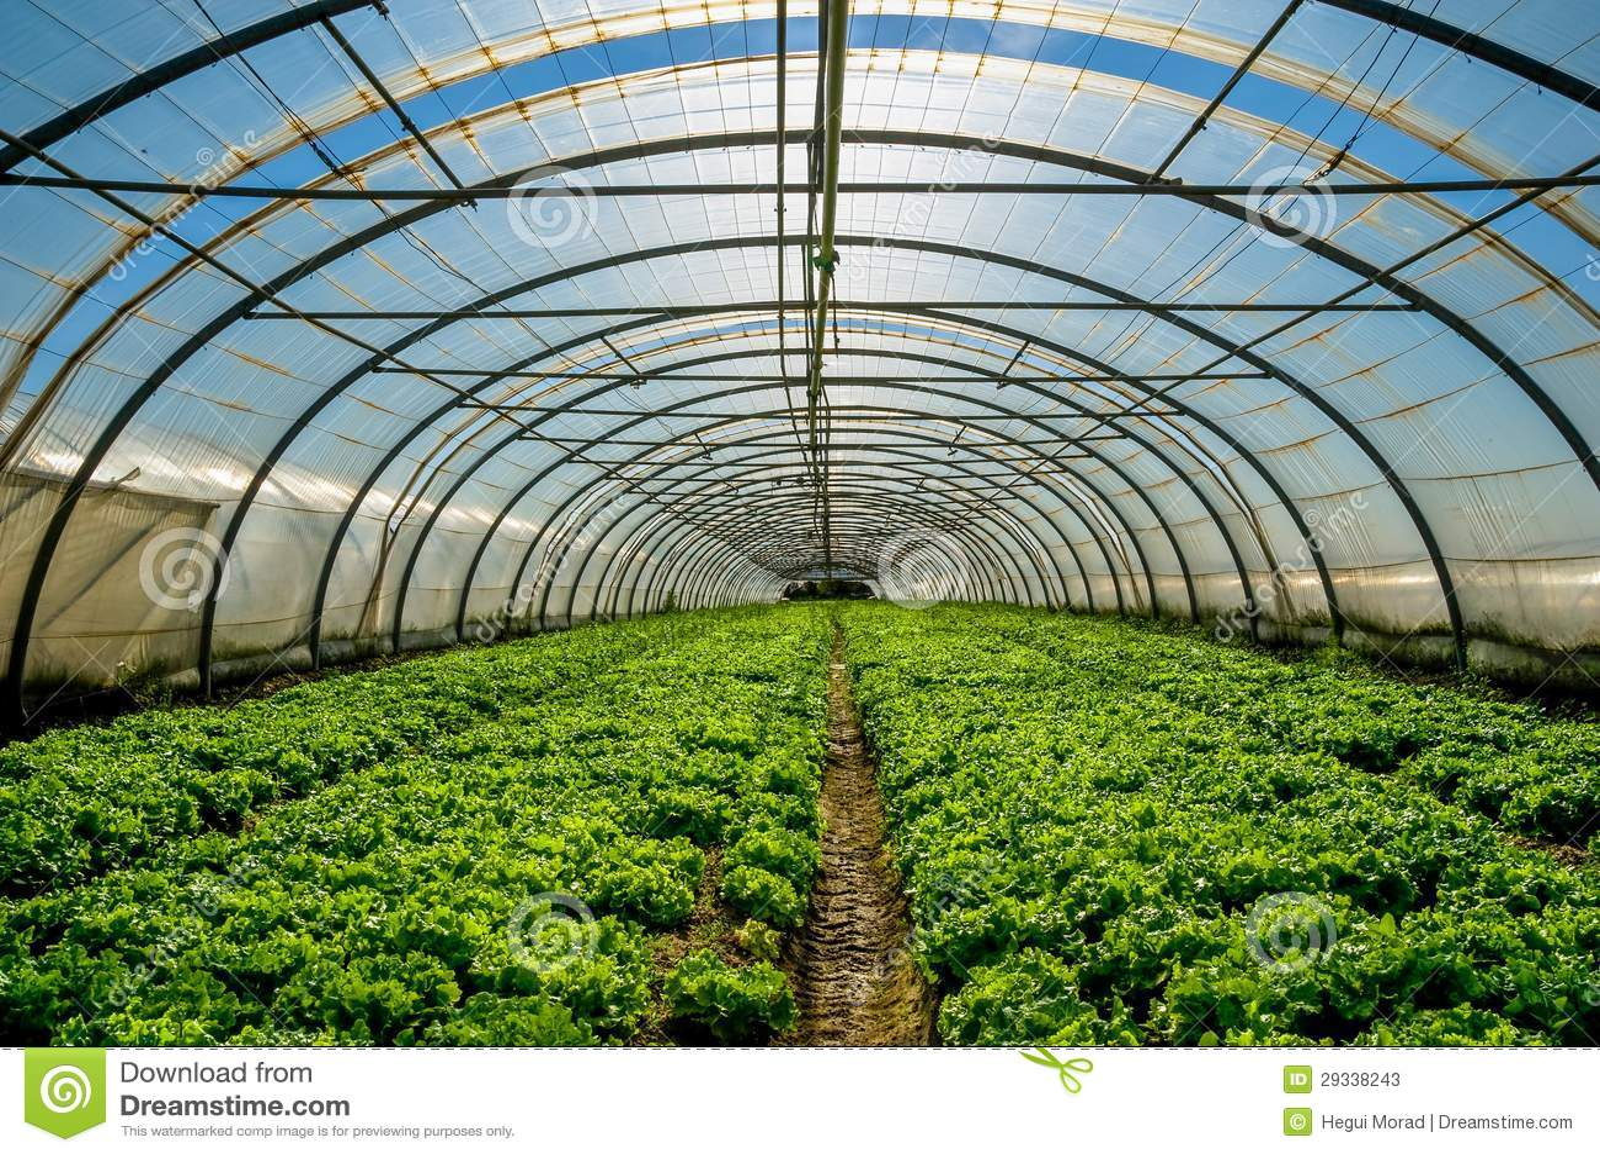 serre chaude pour la culture de la salade image stock image du cordon lumi re 29338243. Black Bedroom Furniture Sets. Home Design Ideas